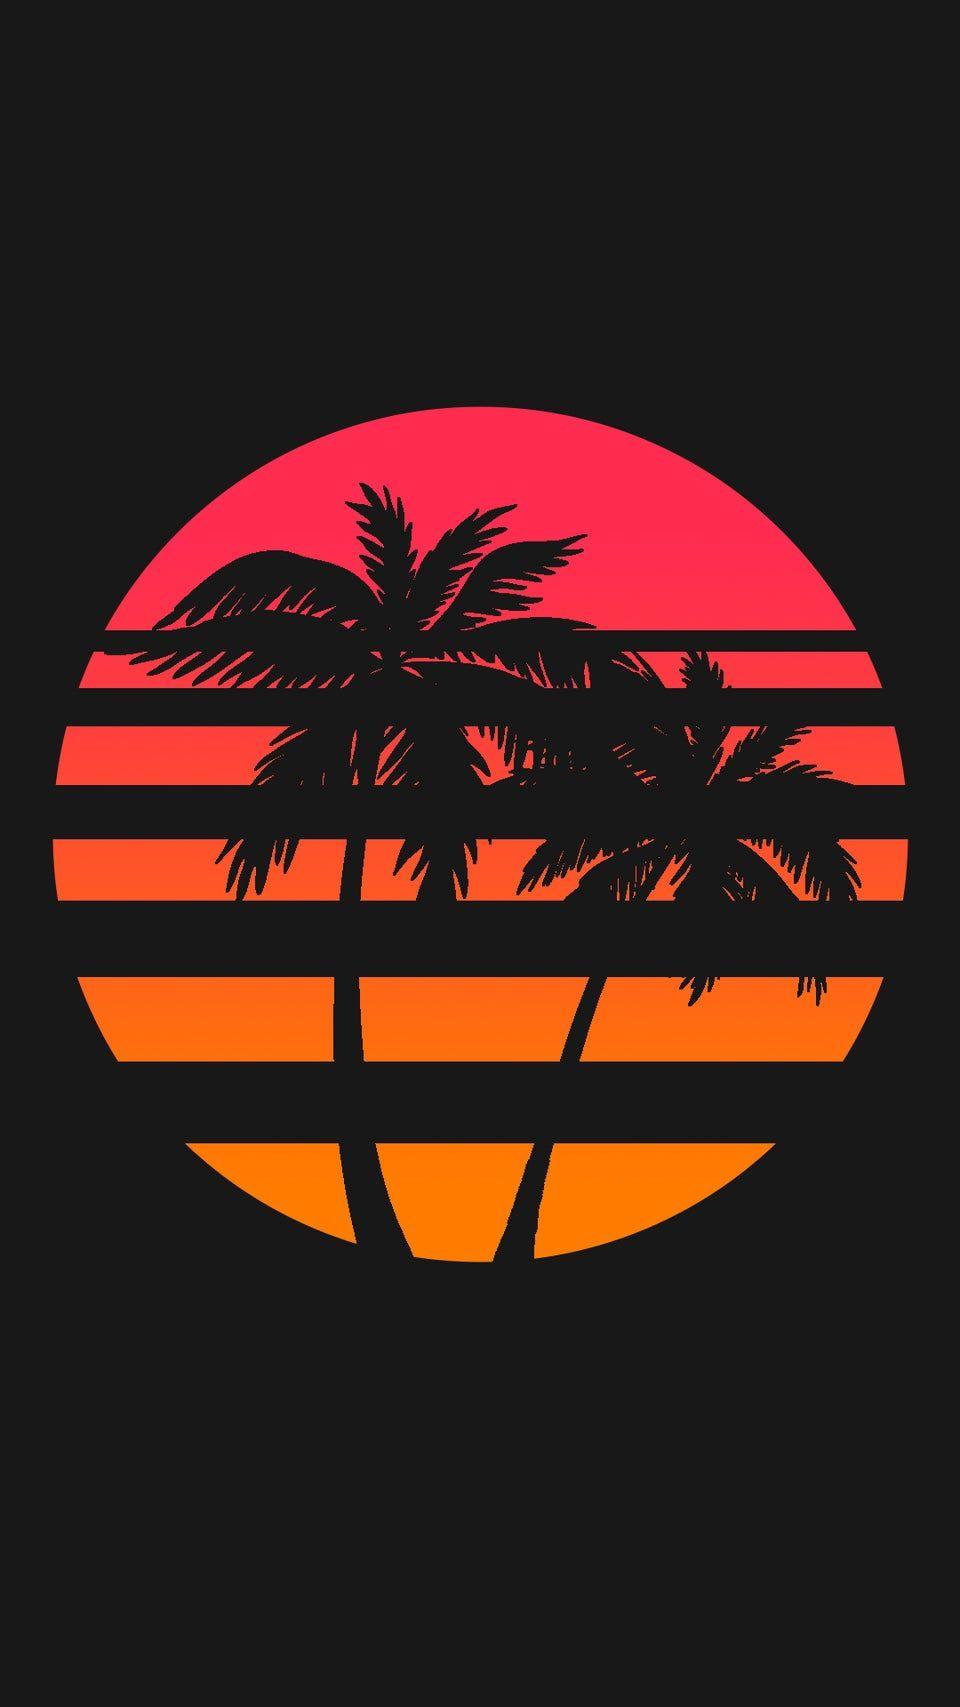 Reddit Iwallpaper 1080x1920 Retrowave Palm Sun Wallpaper Neon Wallpaper Ponsel Hitam Seni Murni